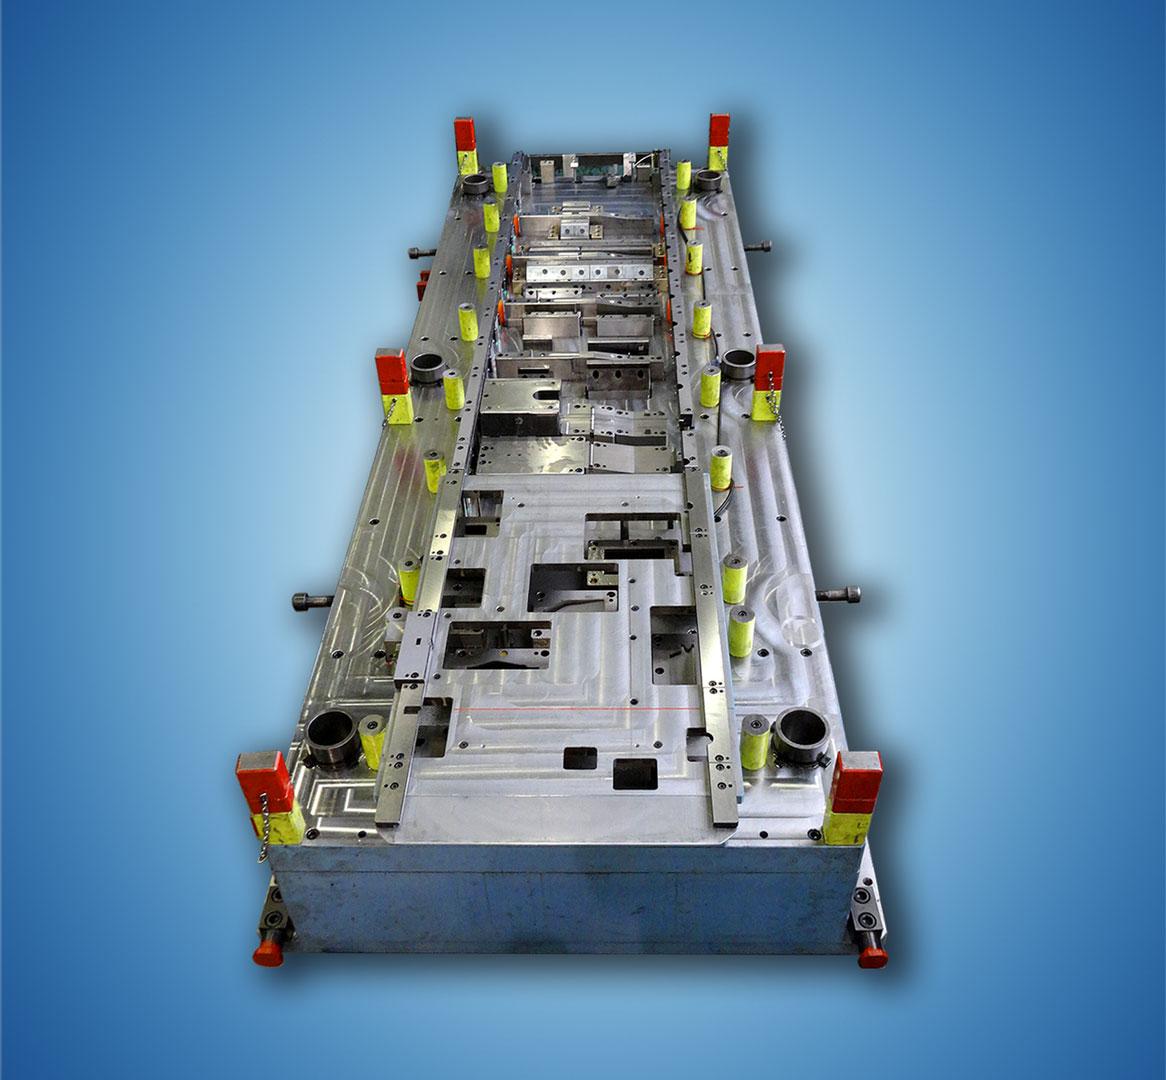 Ero-Projekt-d.o.o.-Toolshop-Werkzeugbau-5-Orodje-za-preoblikov--plocevine-_-slika-3